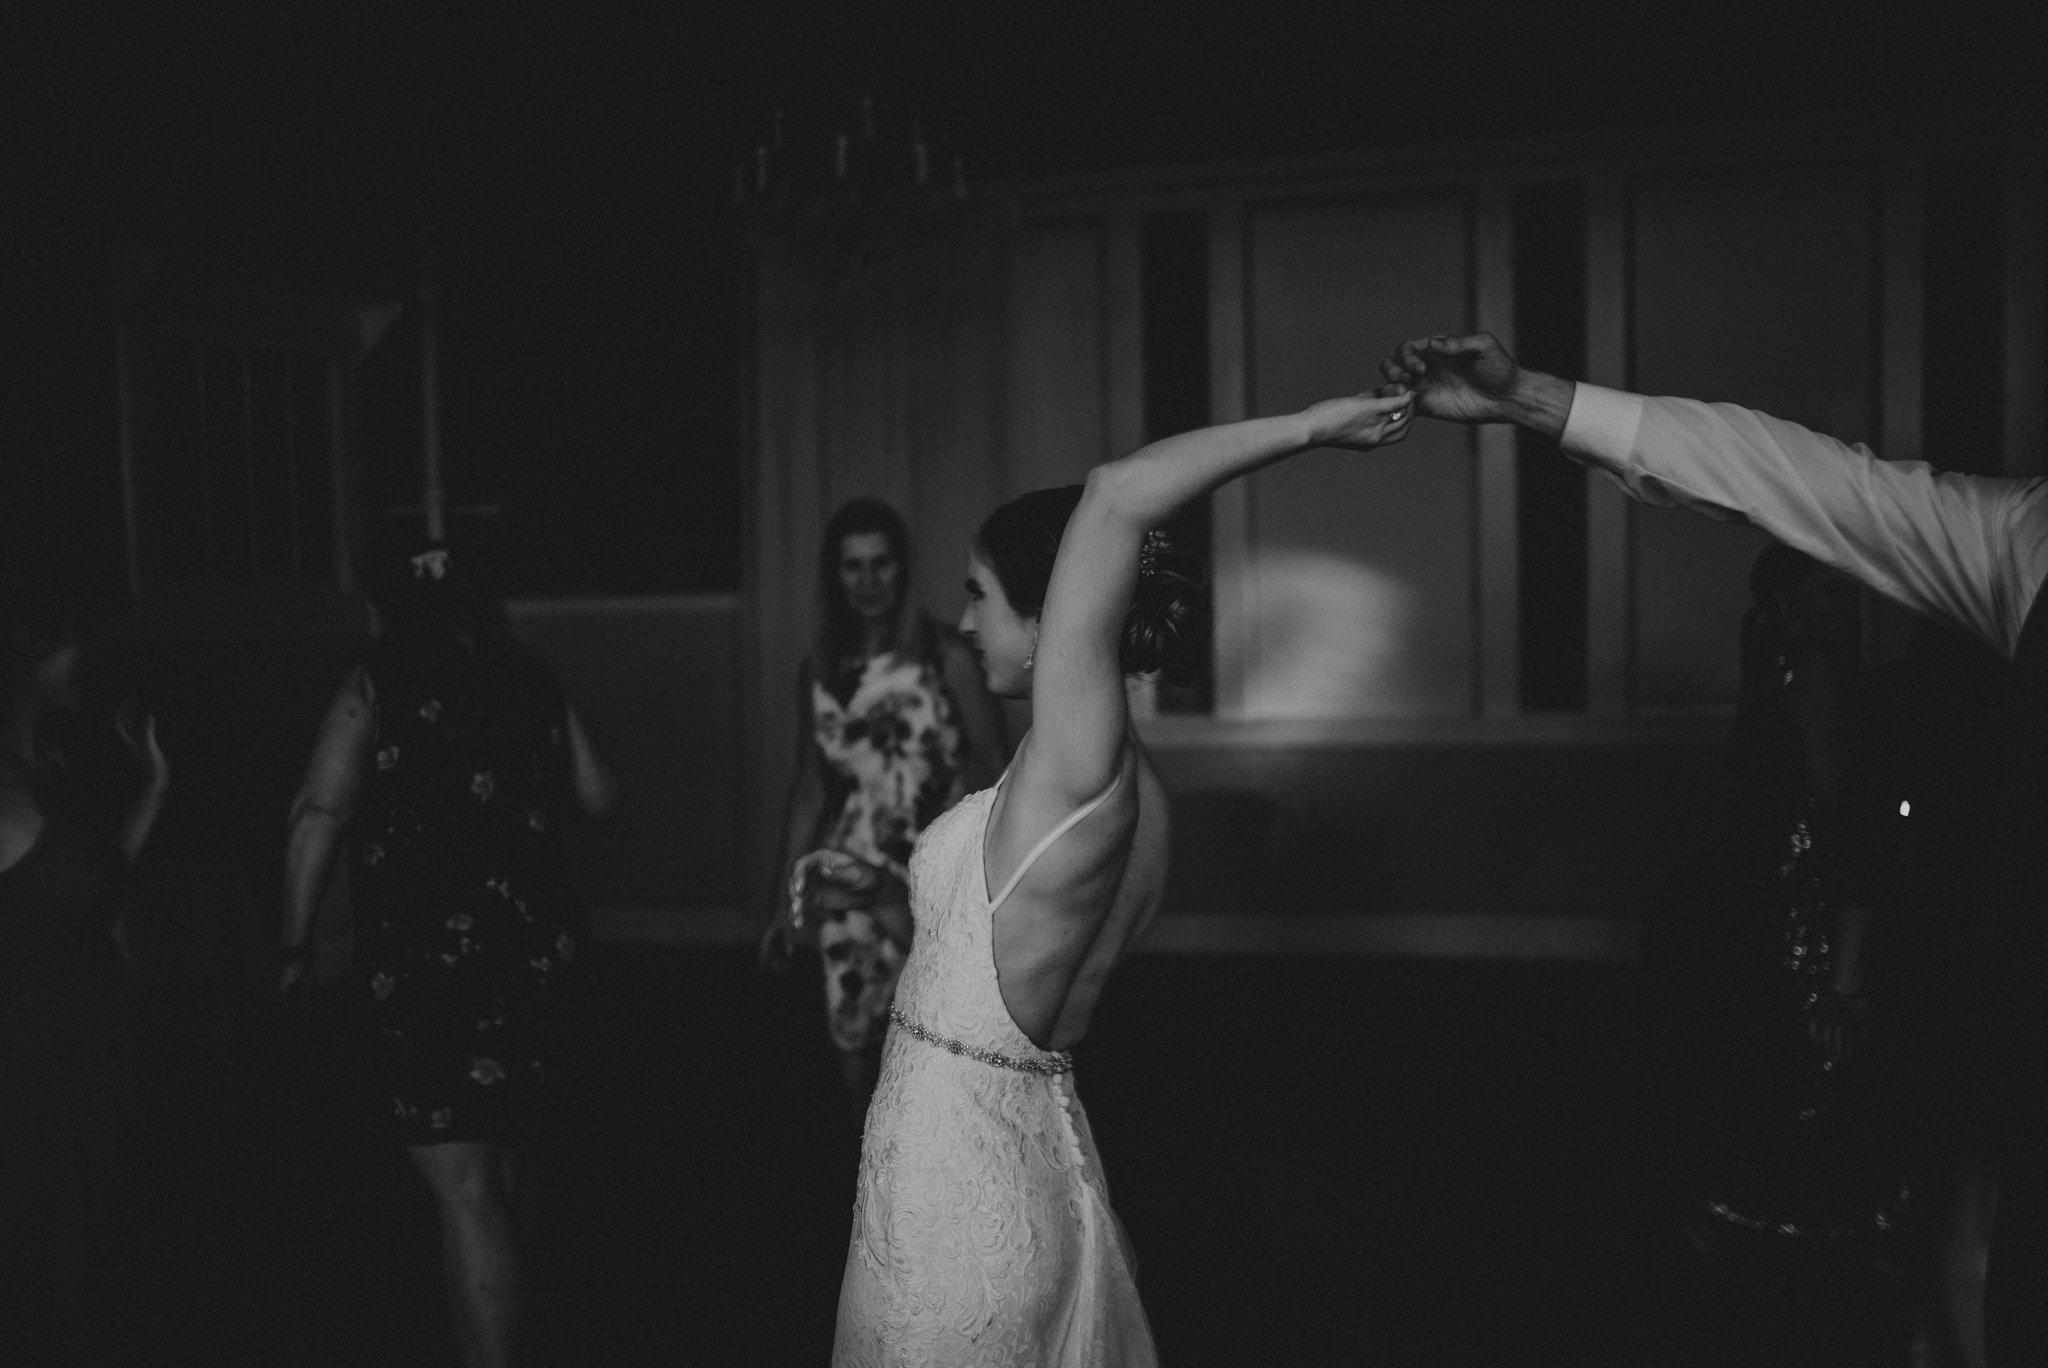 hollywood-school-house-wedding-seattle-photographer-caitlyn-nikula-128.jpg